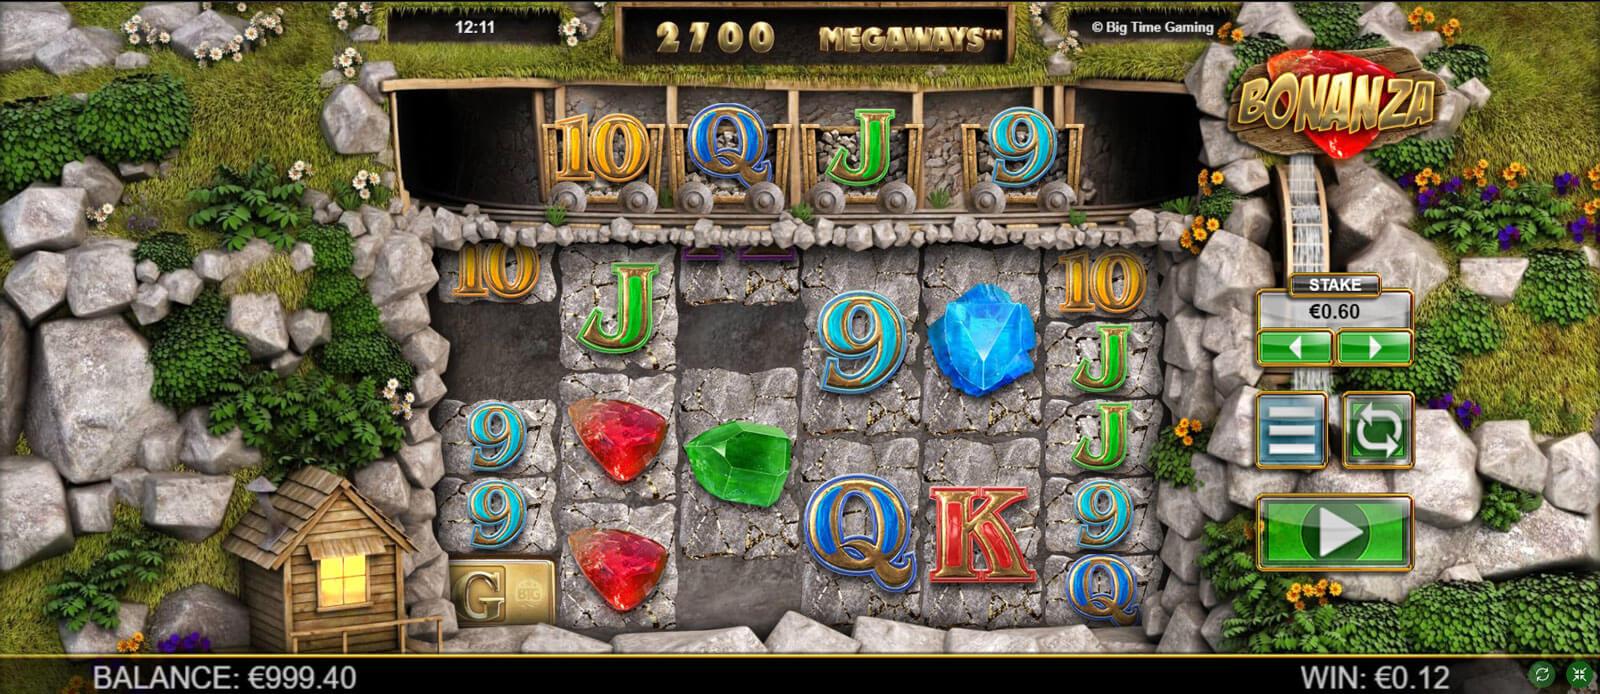 Bonanza Online Slot Screenshot